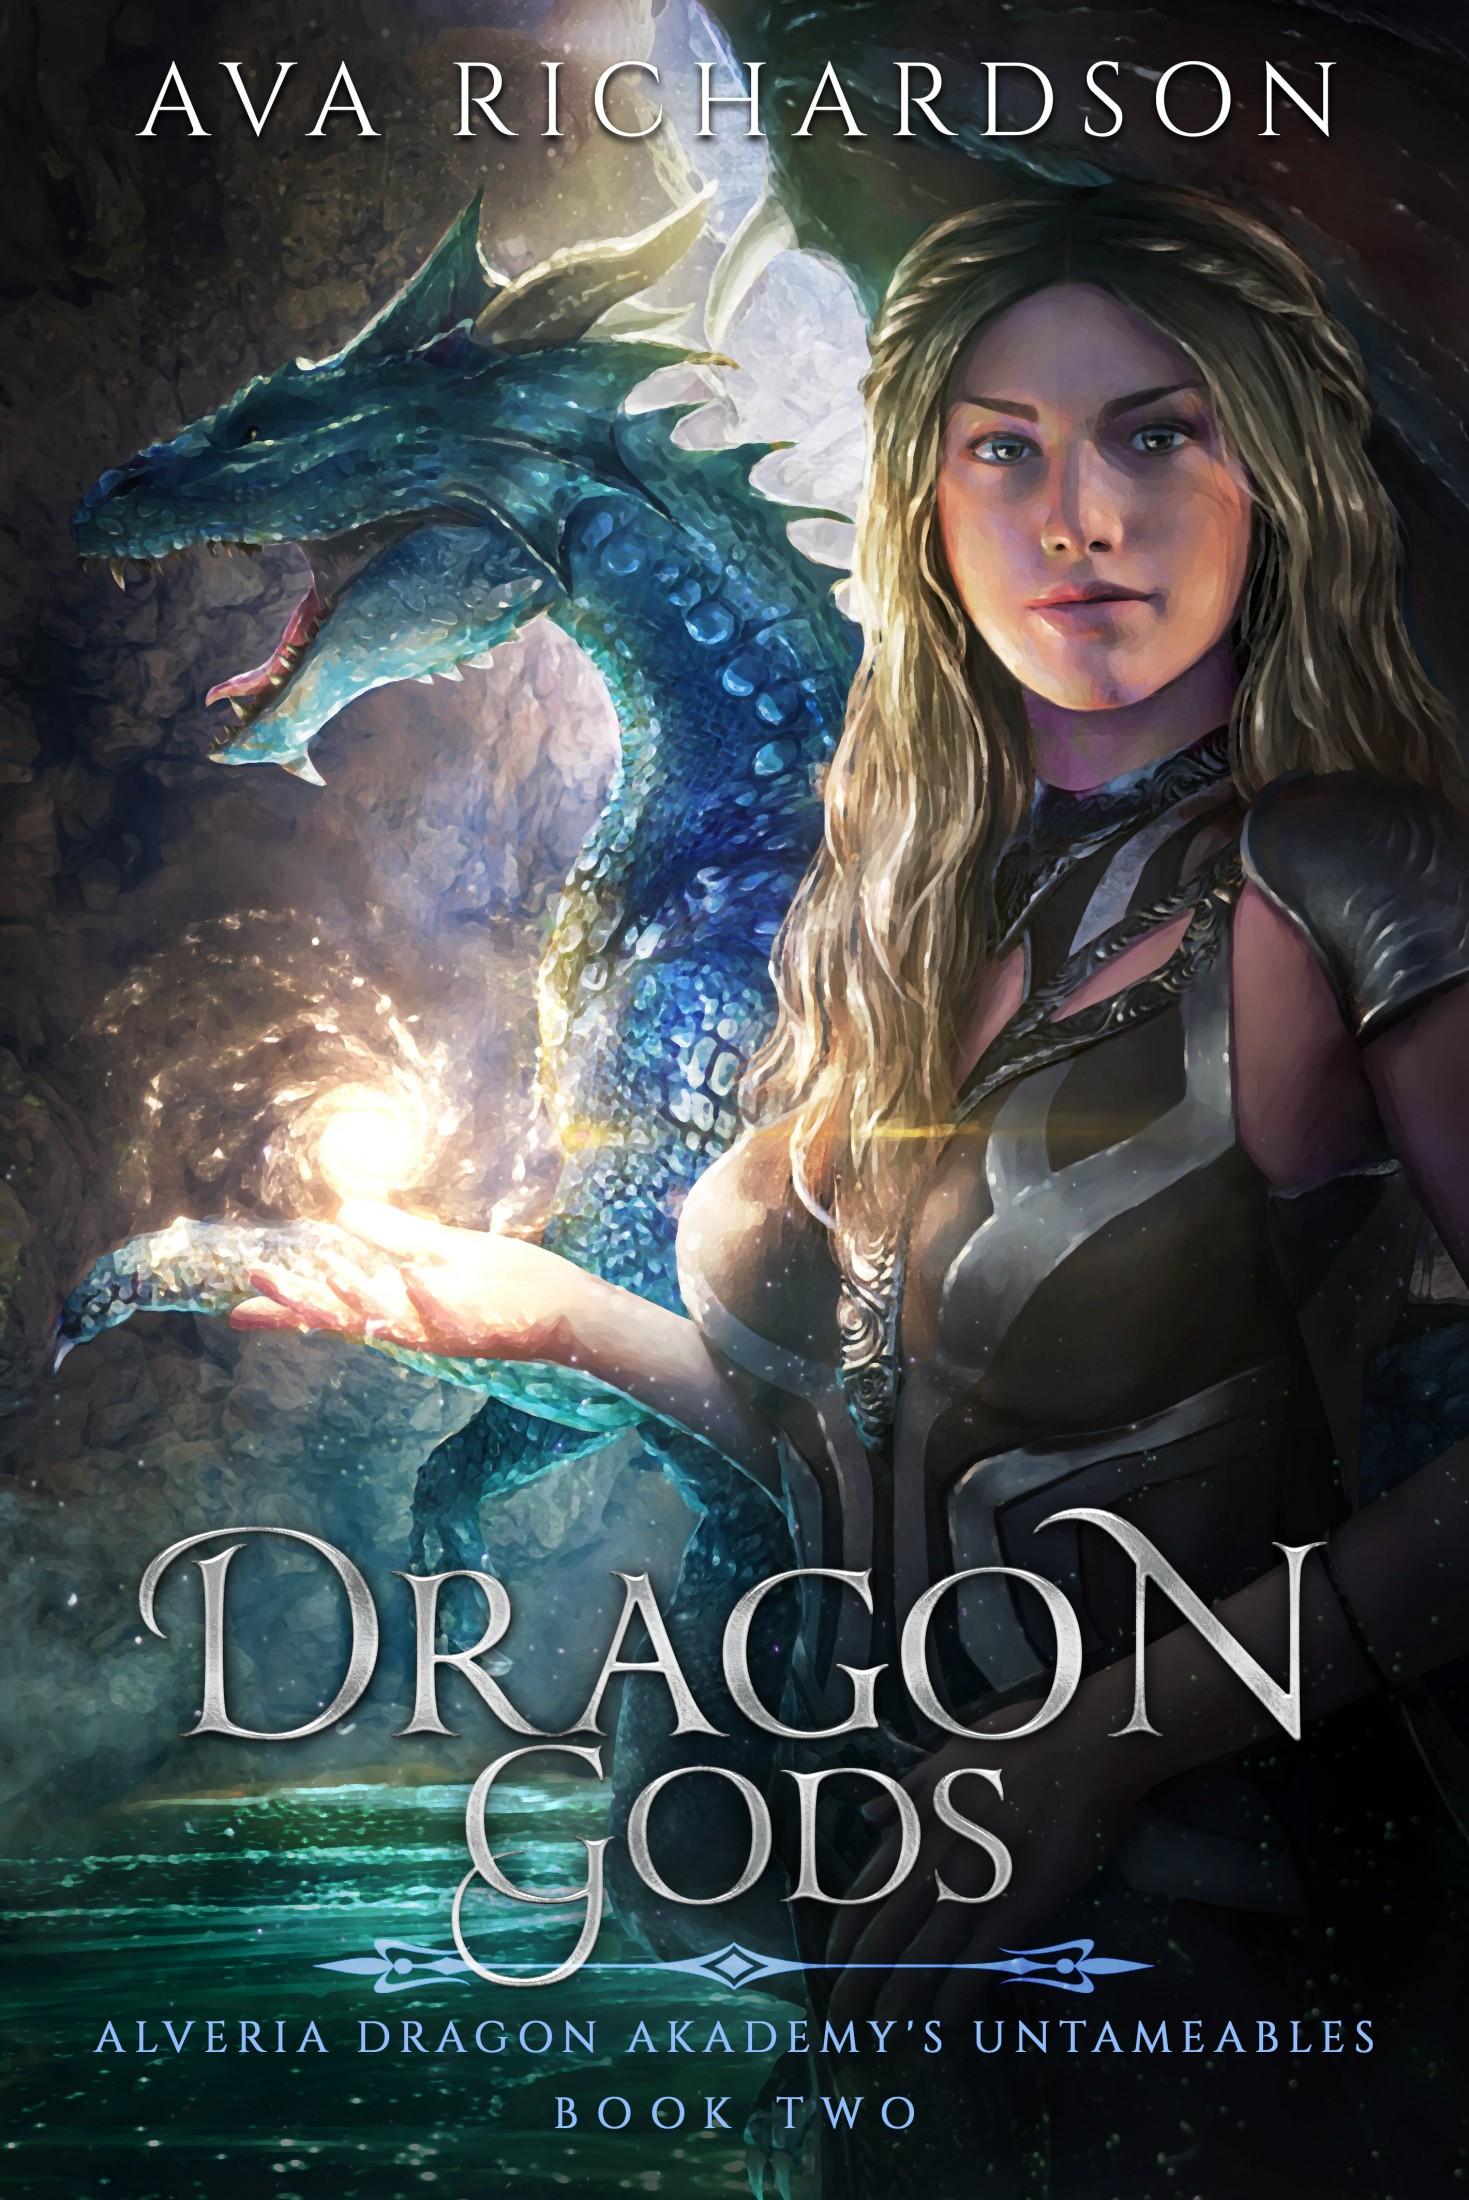 Alveria Dragon Akademy's Untameables Book 2